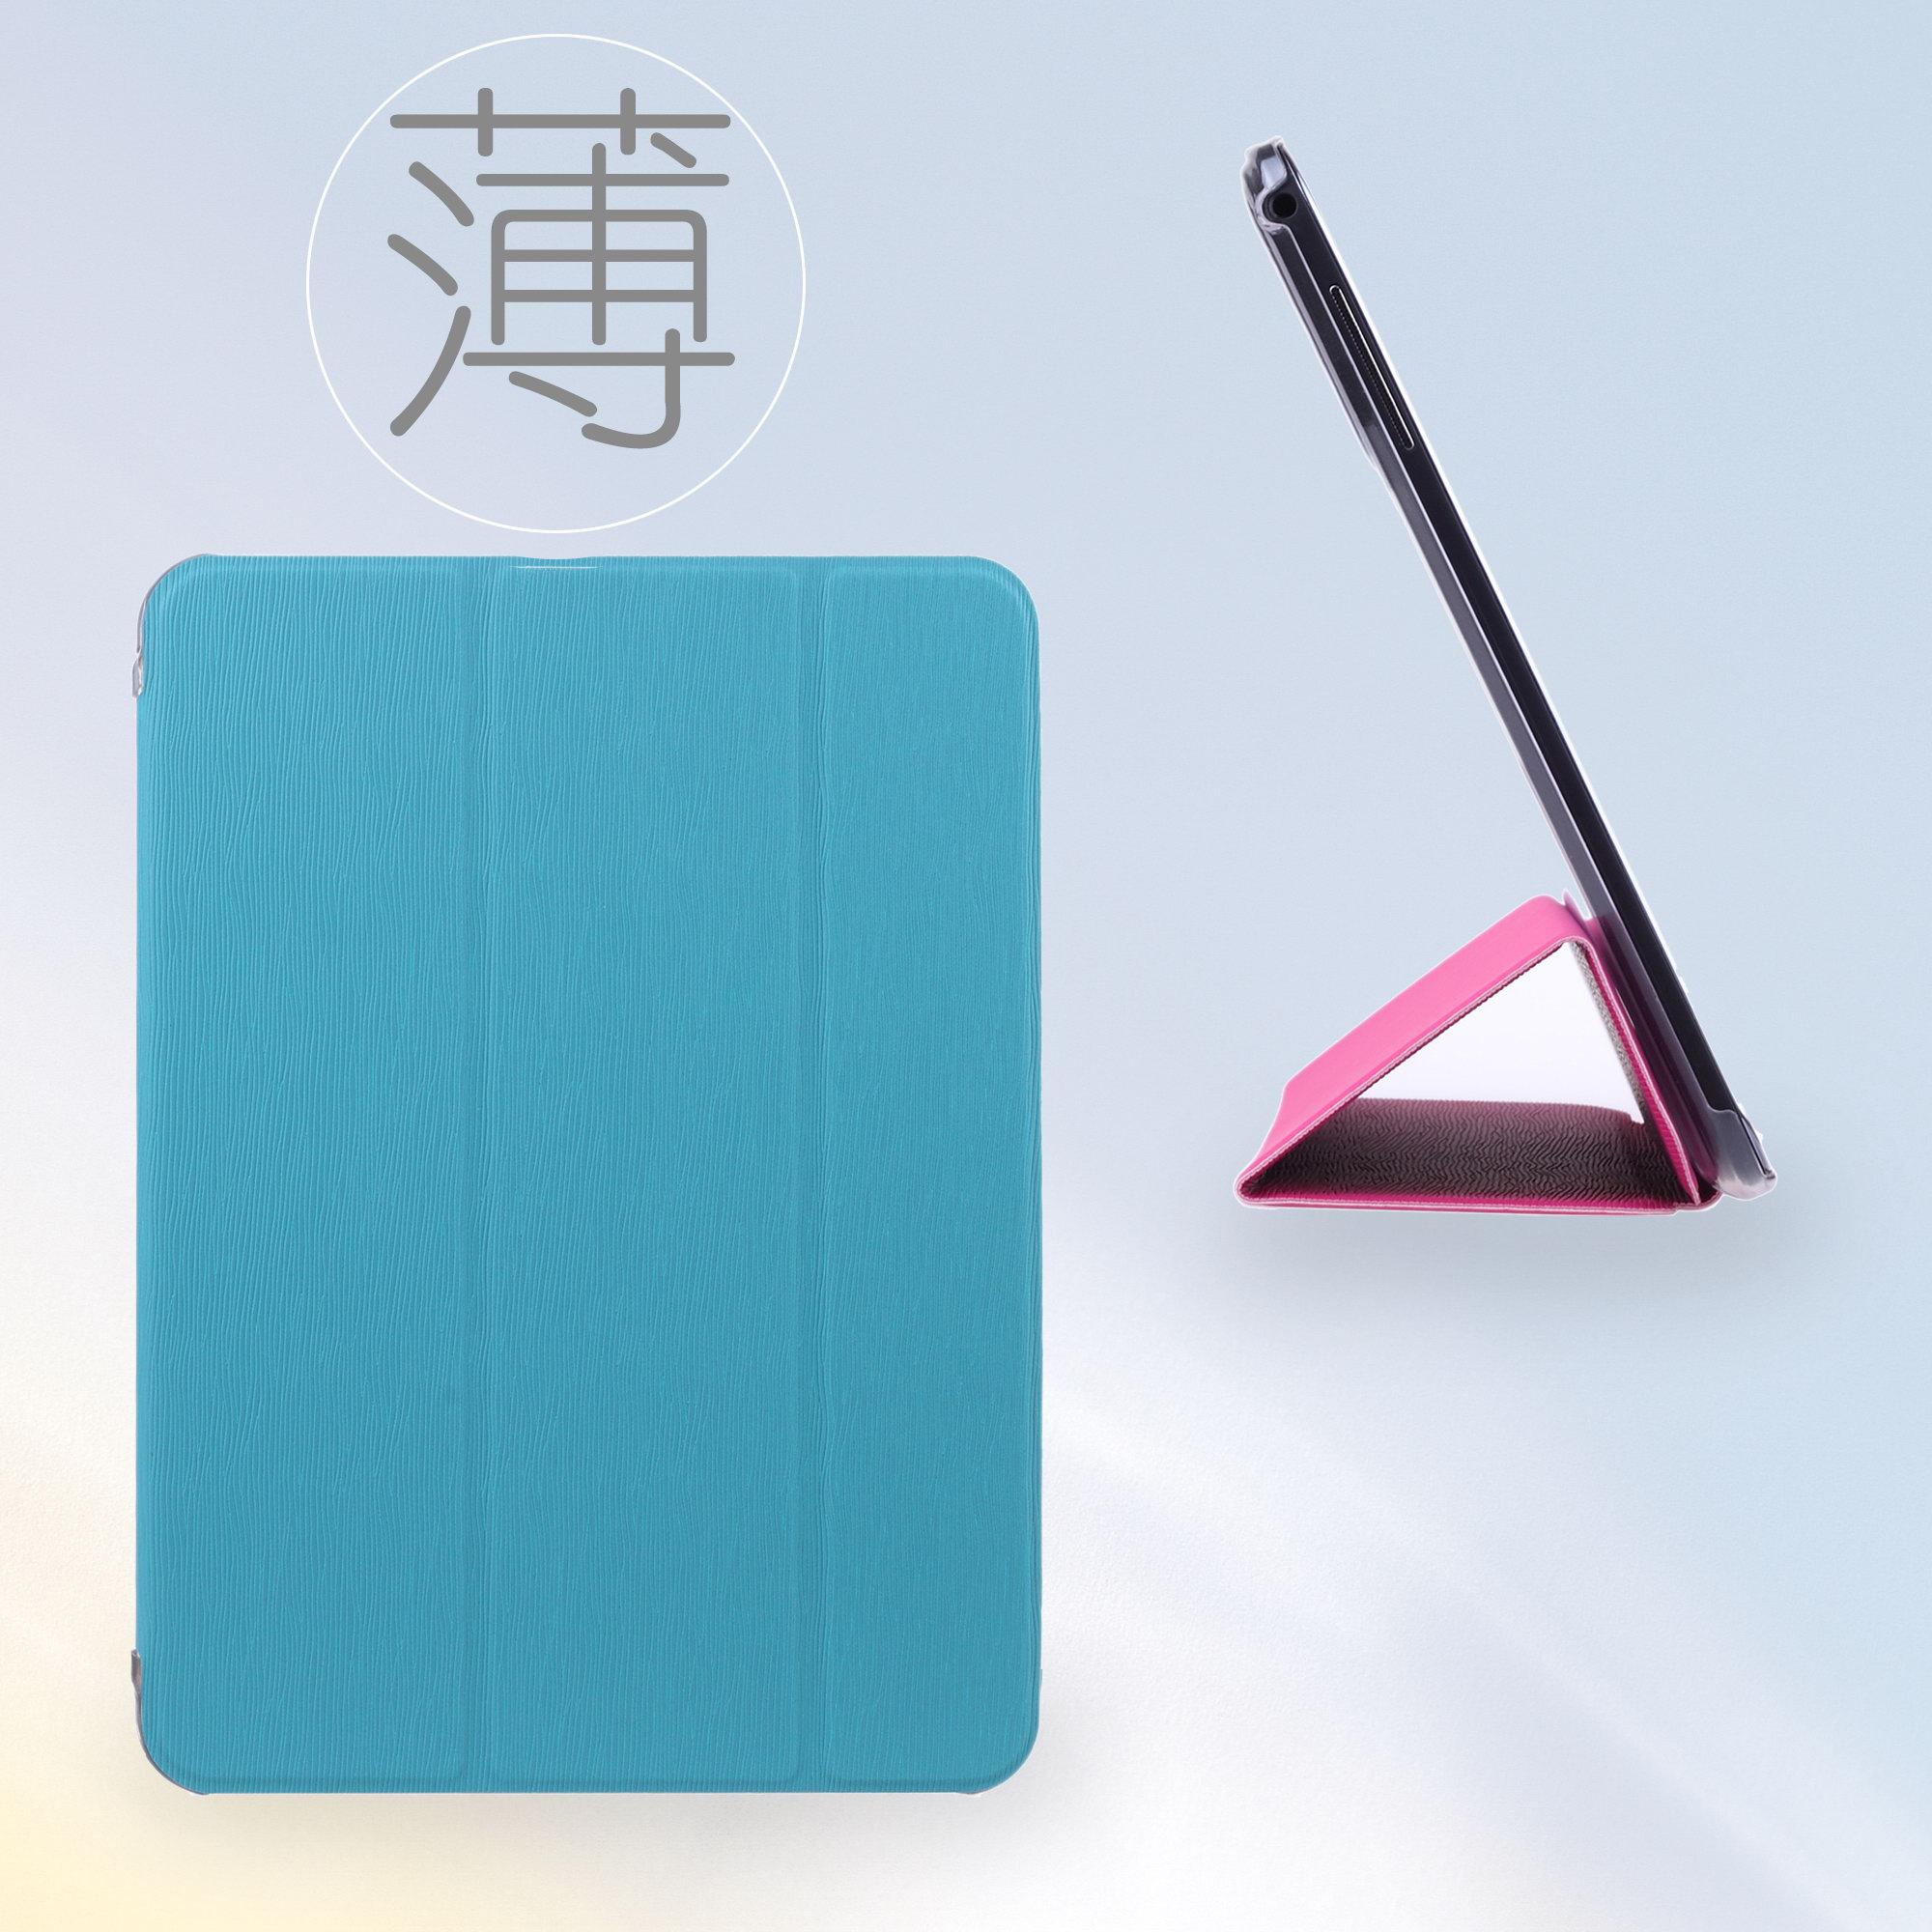 Фото - Чехол для планшета ProMED Shi Galaxy Tab4 T530 T531 чехол для планшета t530 galaxy tab4 10 1 sm t531